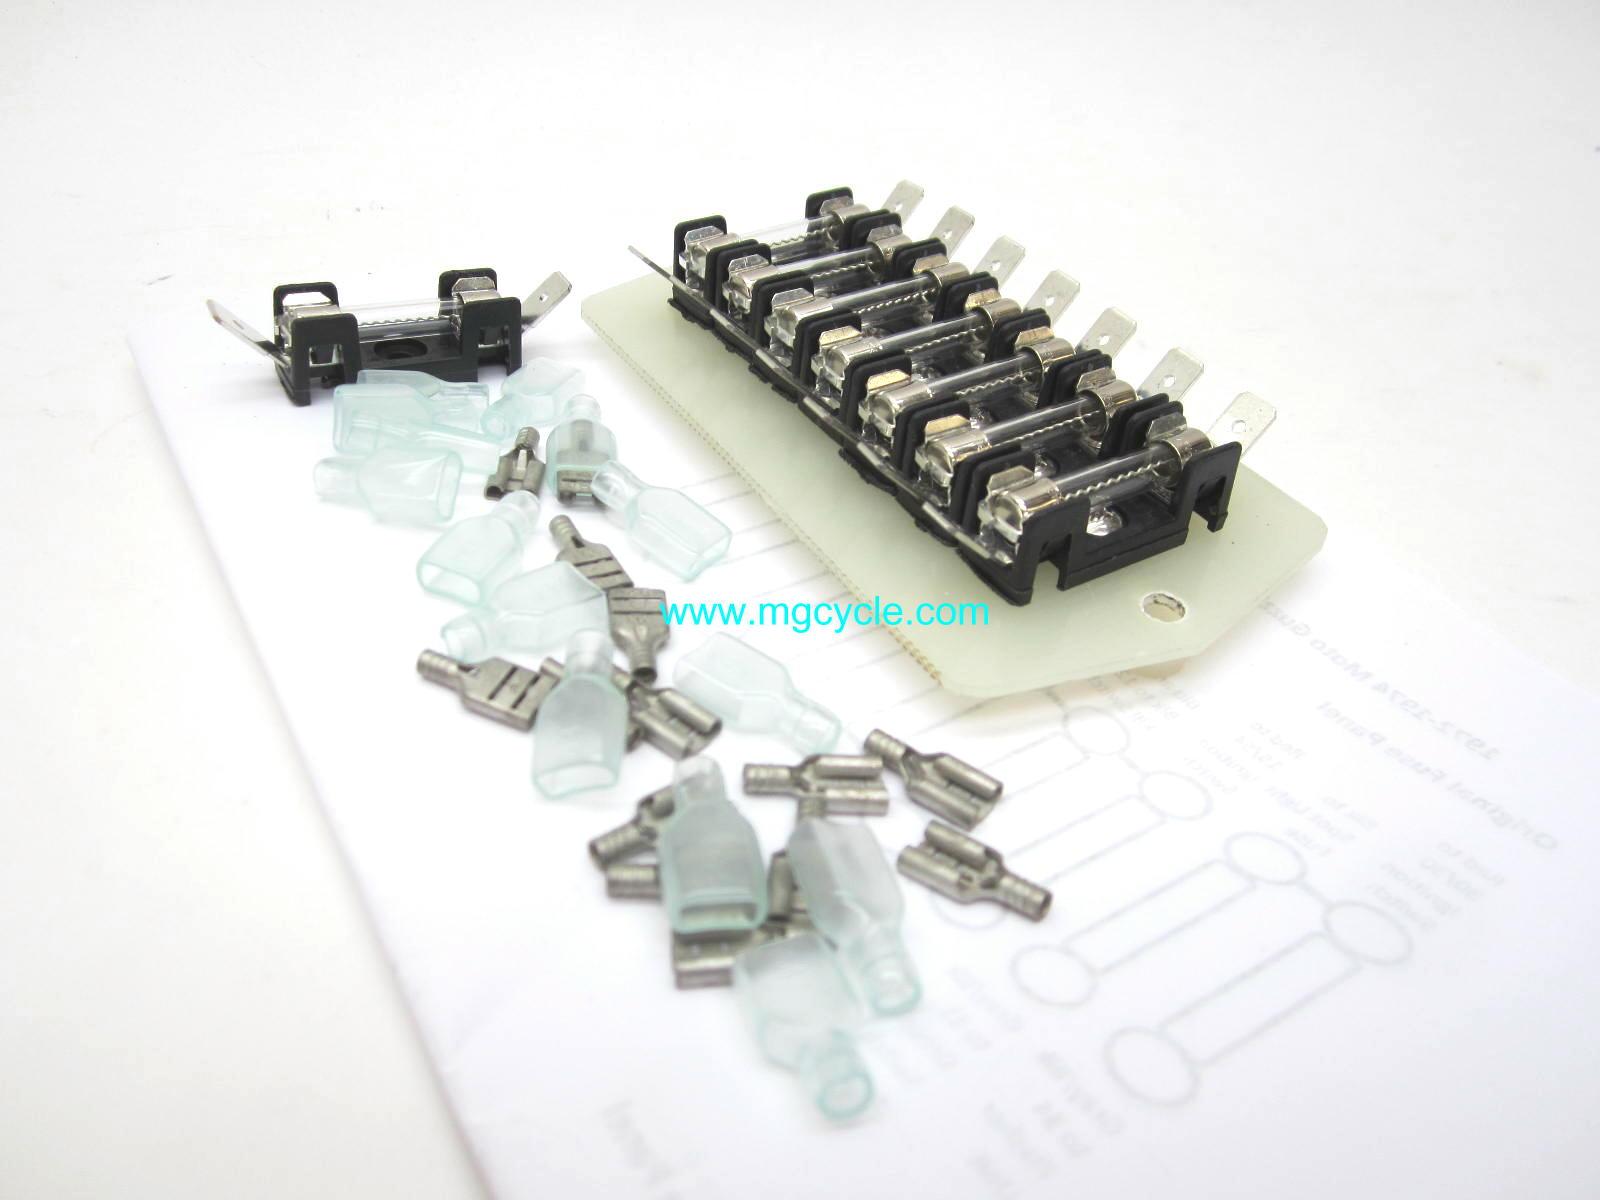 Fuse Block Replacements And Alternatives Loop Frames Moto Guzzi Car Box Repment Replacement For V700 V7 Special Ambassador 850 Gt